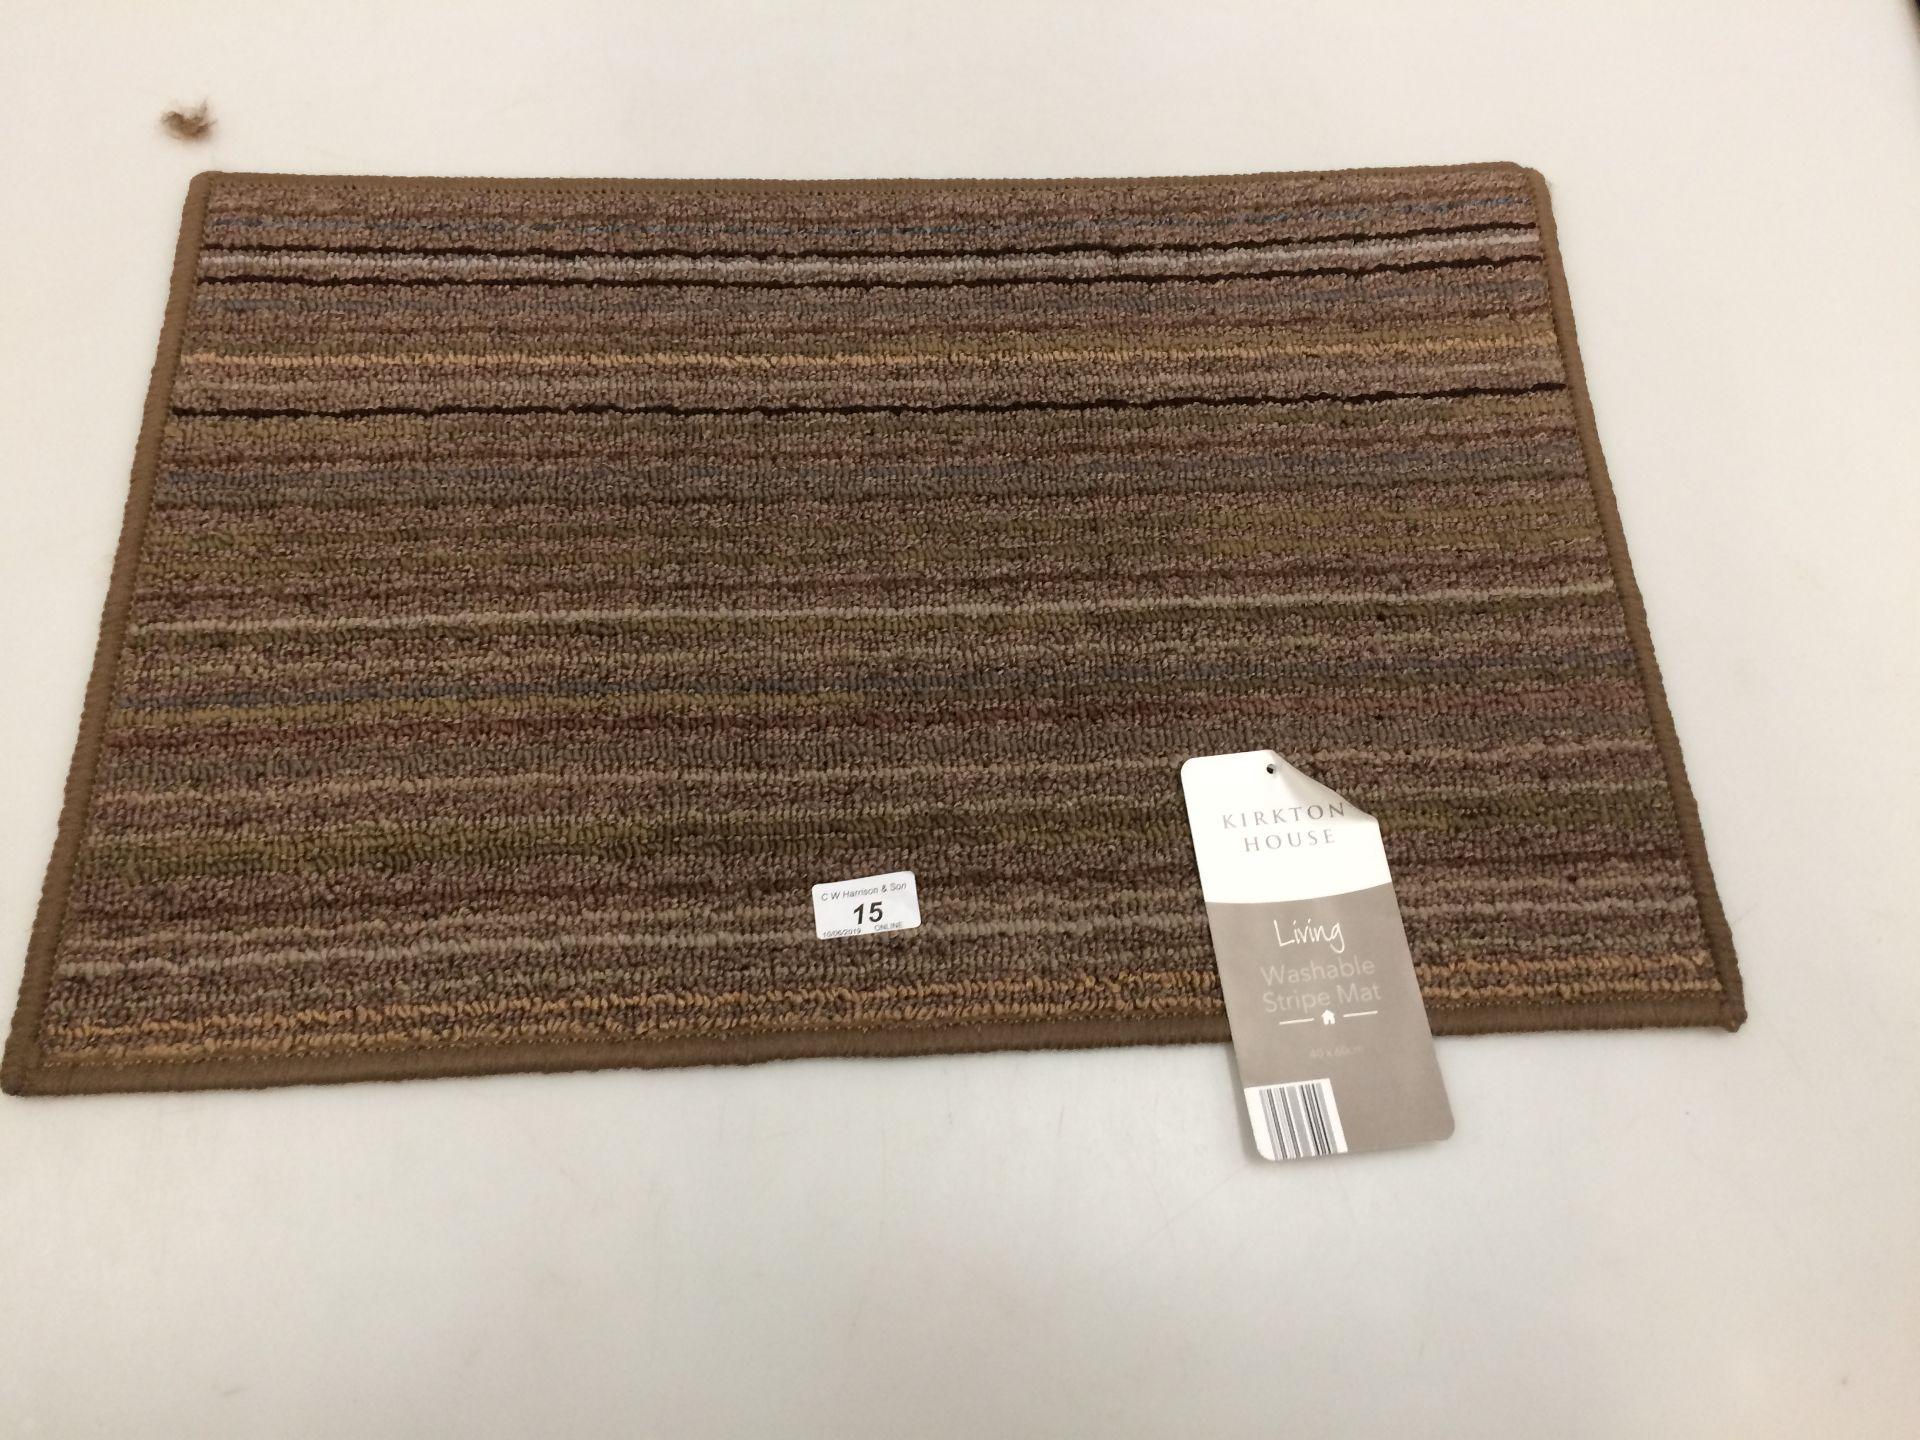 Lot 15 - 10 x Kirkton House brown multi striped washable door mats each 40 x 60cm